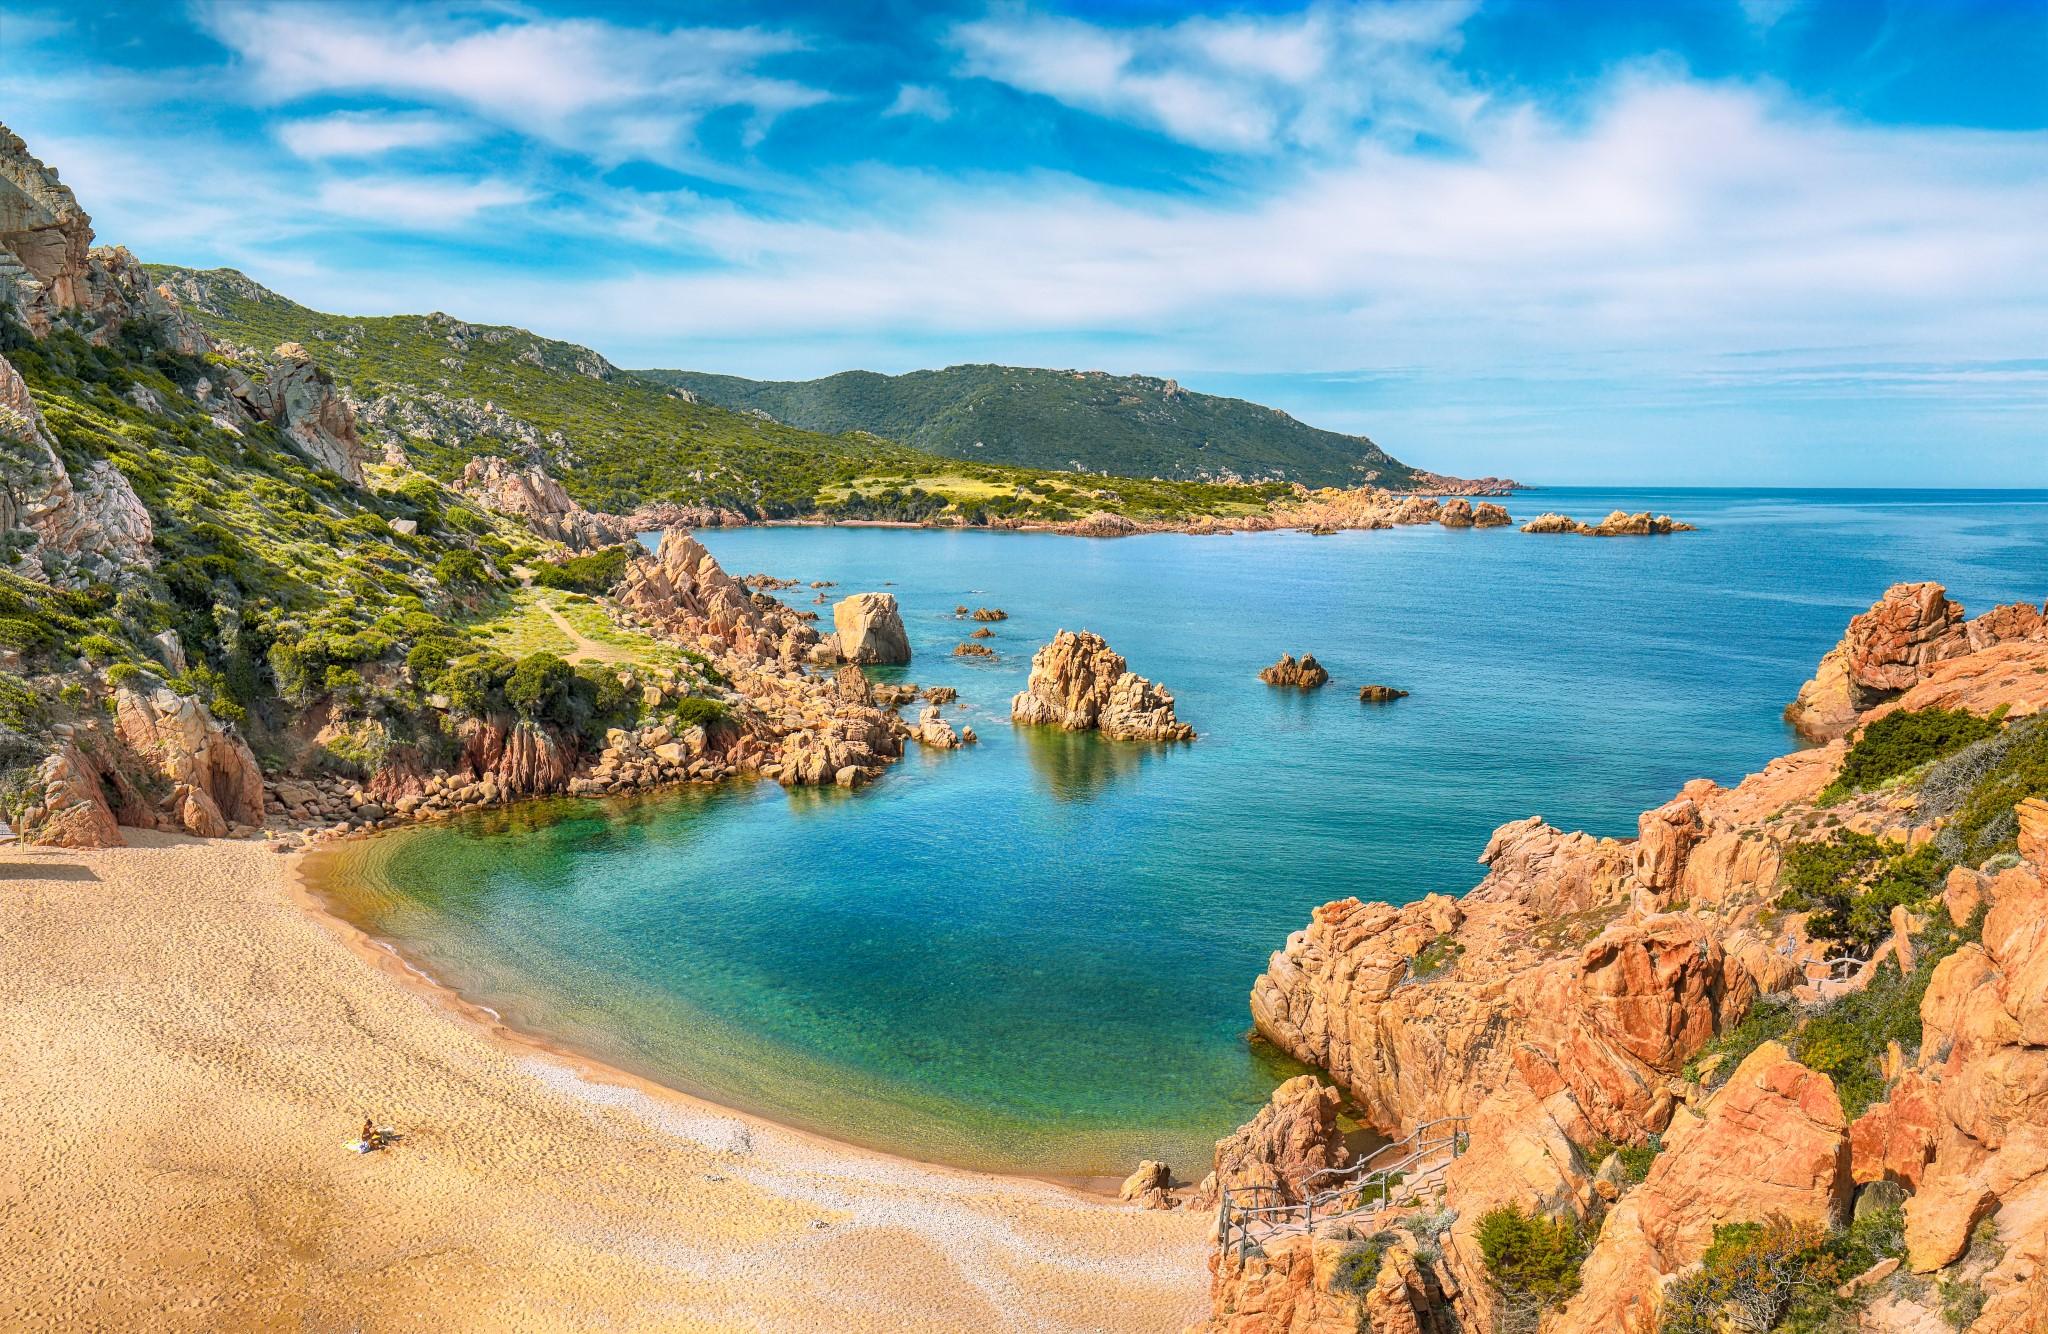 Captivating view of Li Cossi beach on Costa Paradiso resort. Picturesque seascape of Mediterranean sea. Location:  Costa Paradiso, Province of Sassari, Sardinia, Italy, Europe